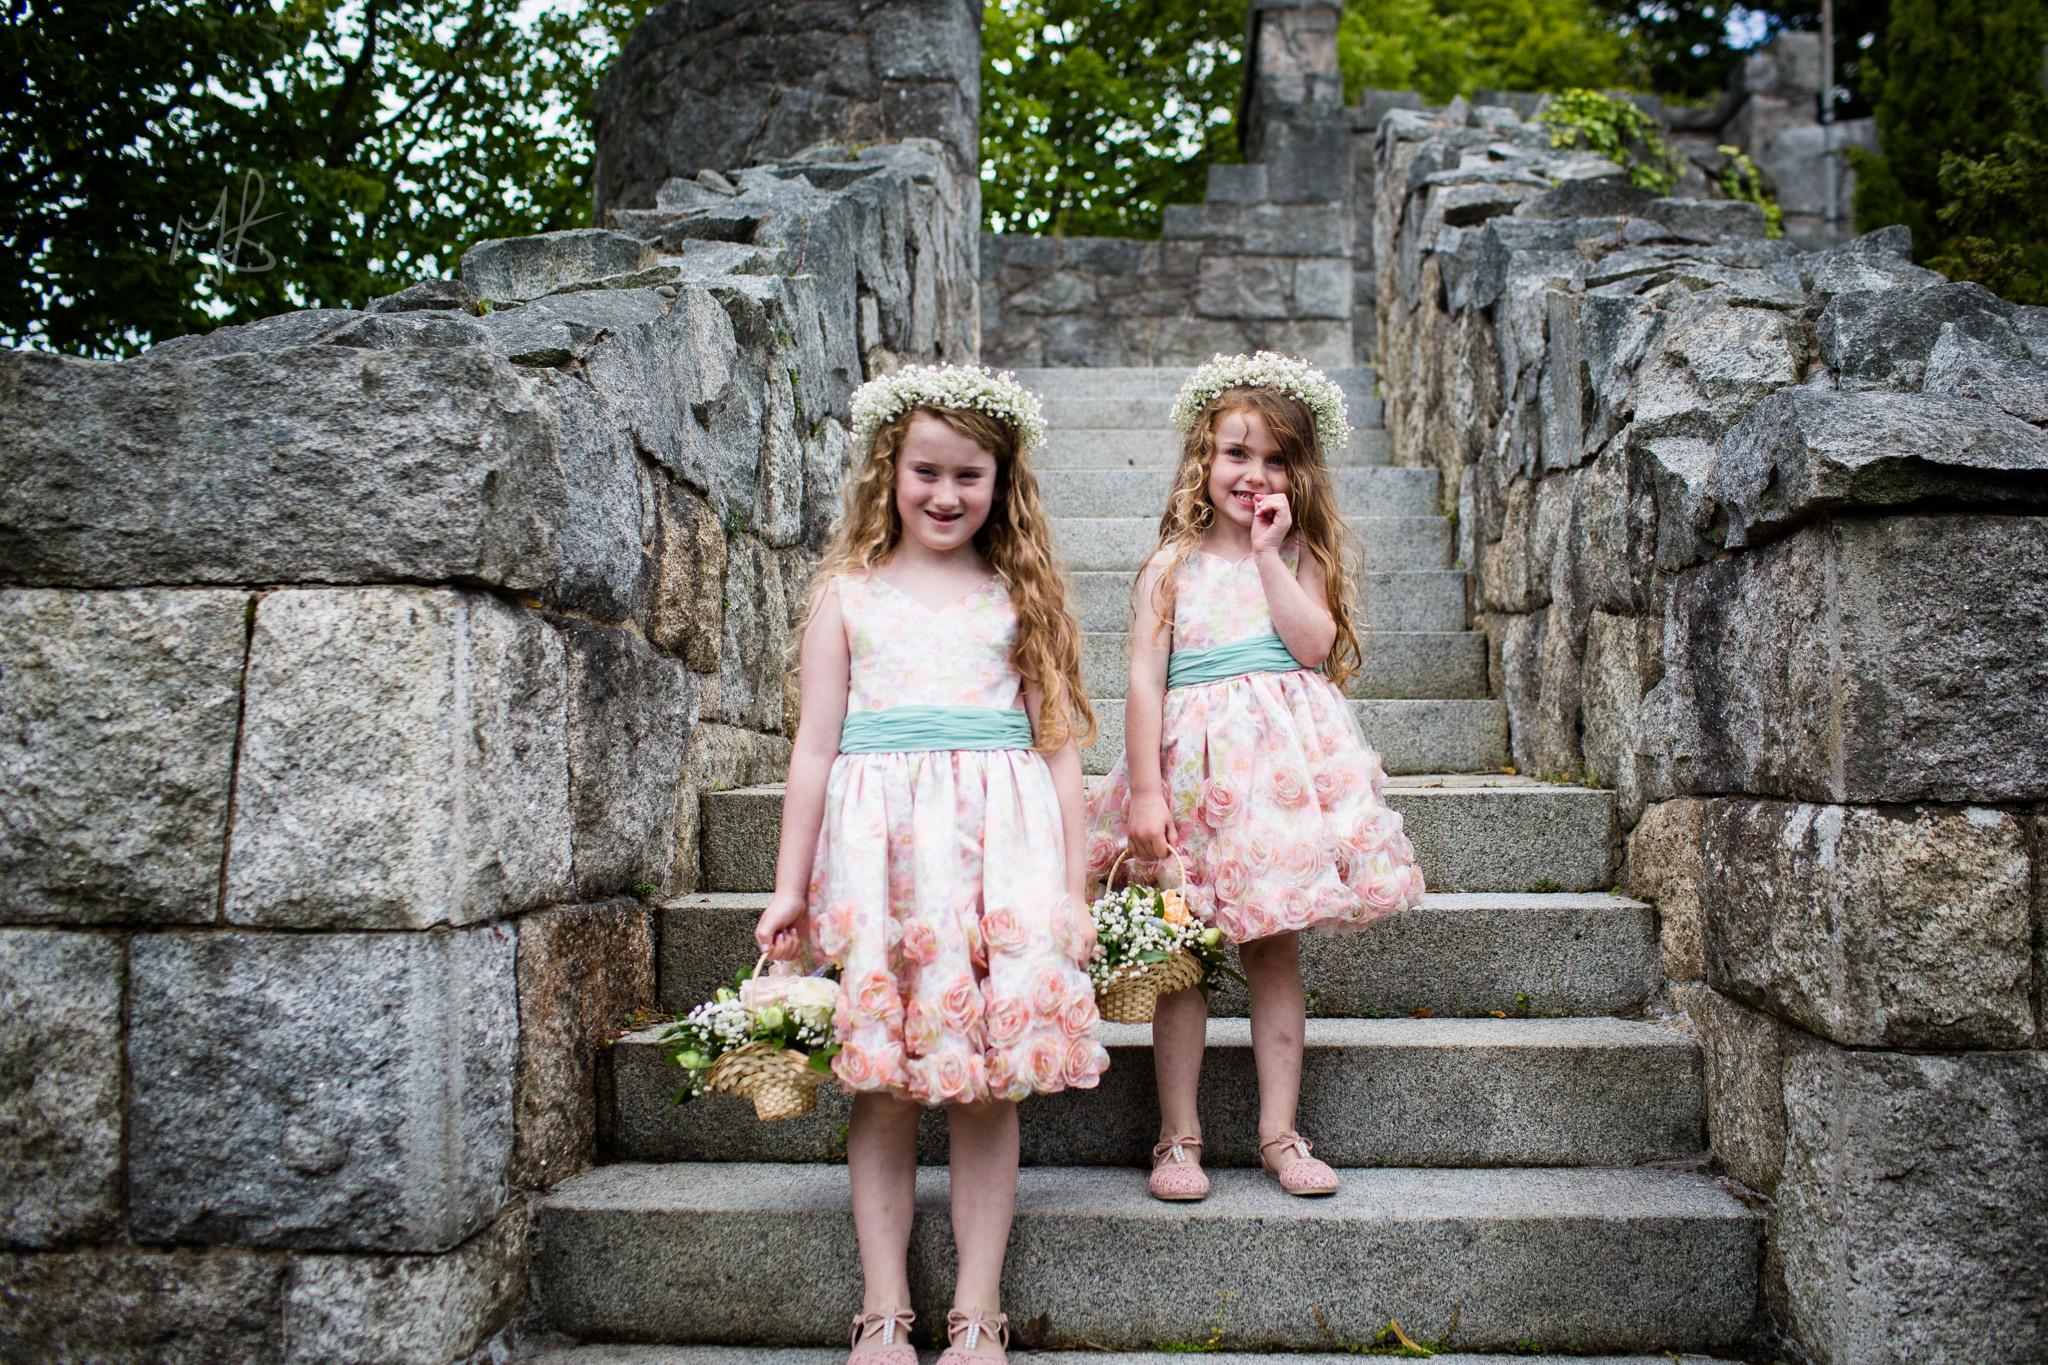 Northern-Ireland-Wedding-Photographer-Mark-Barnes-Ballymena_wedding-photography-Leighinmohr-House-Seamas_Alanna_For-web-26.jpg